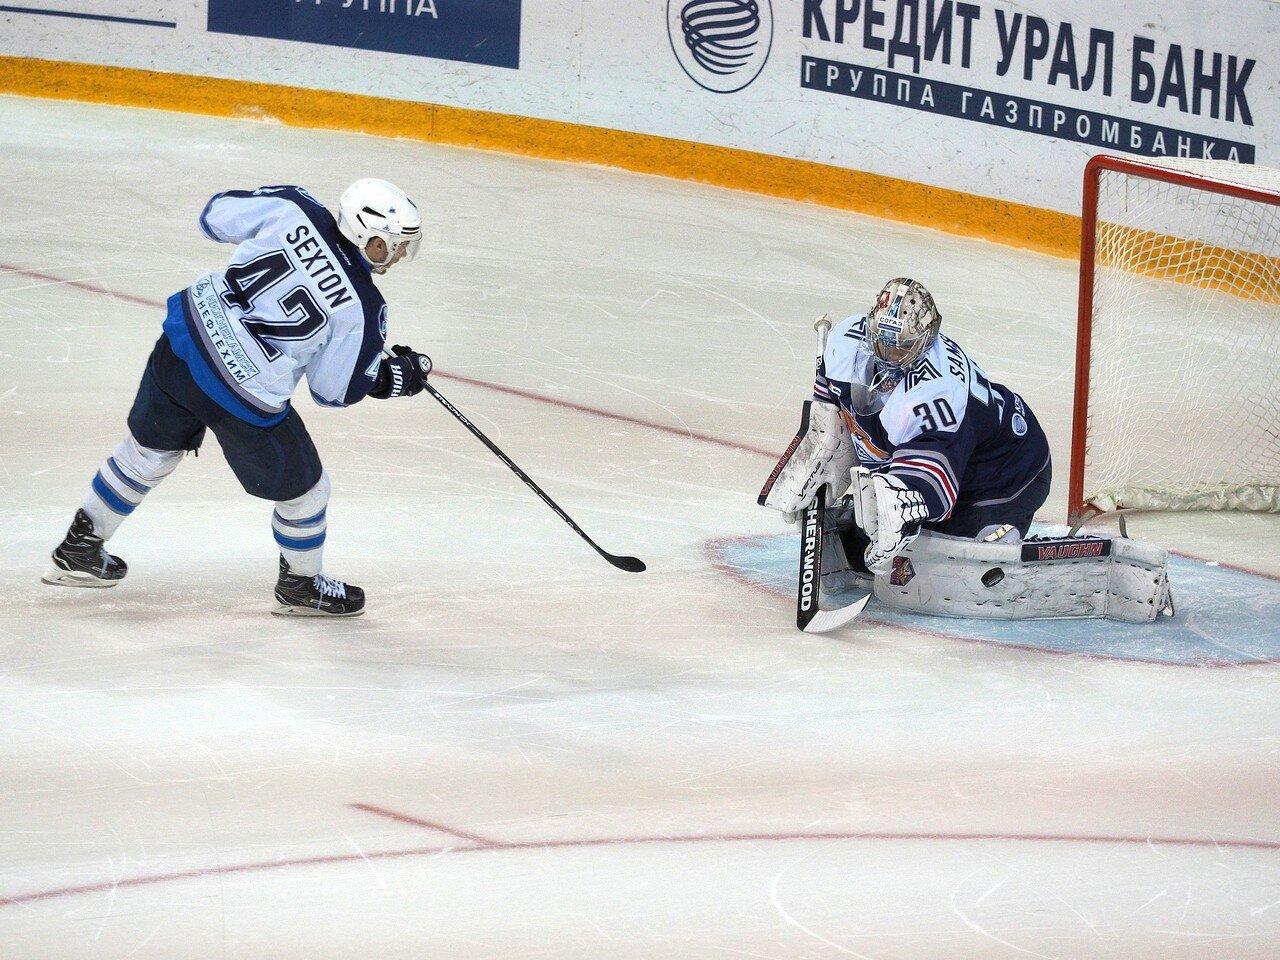 89Металлург - Нефтехимик 08.11.2016